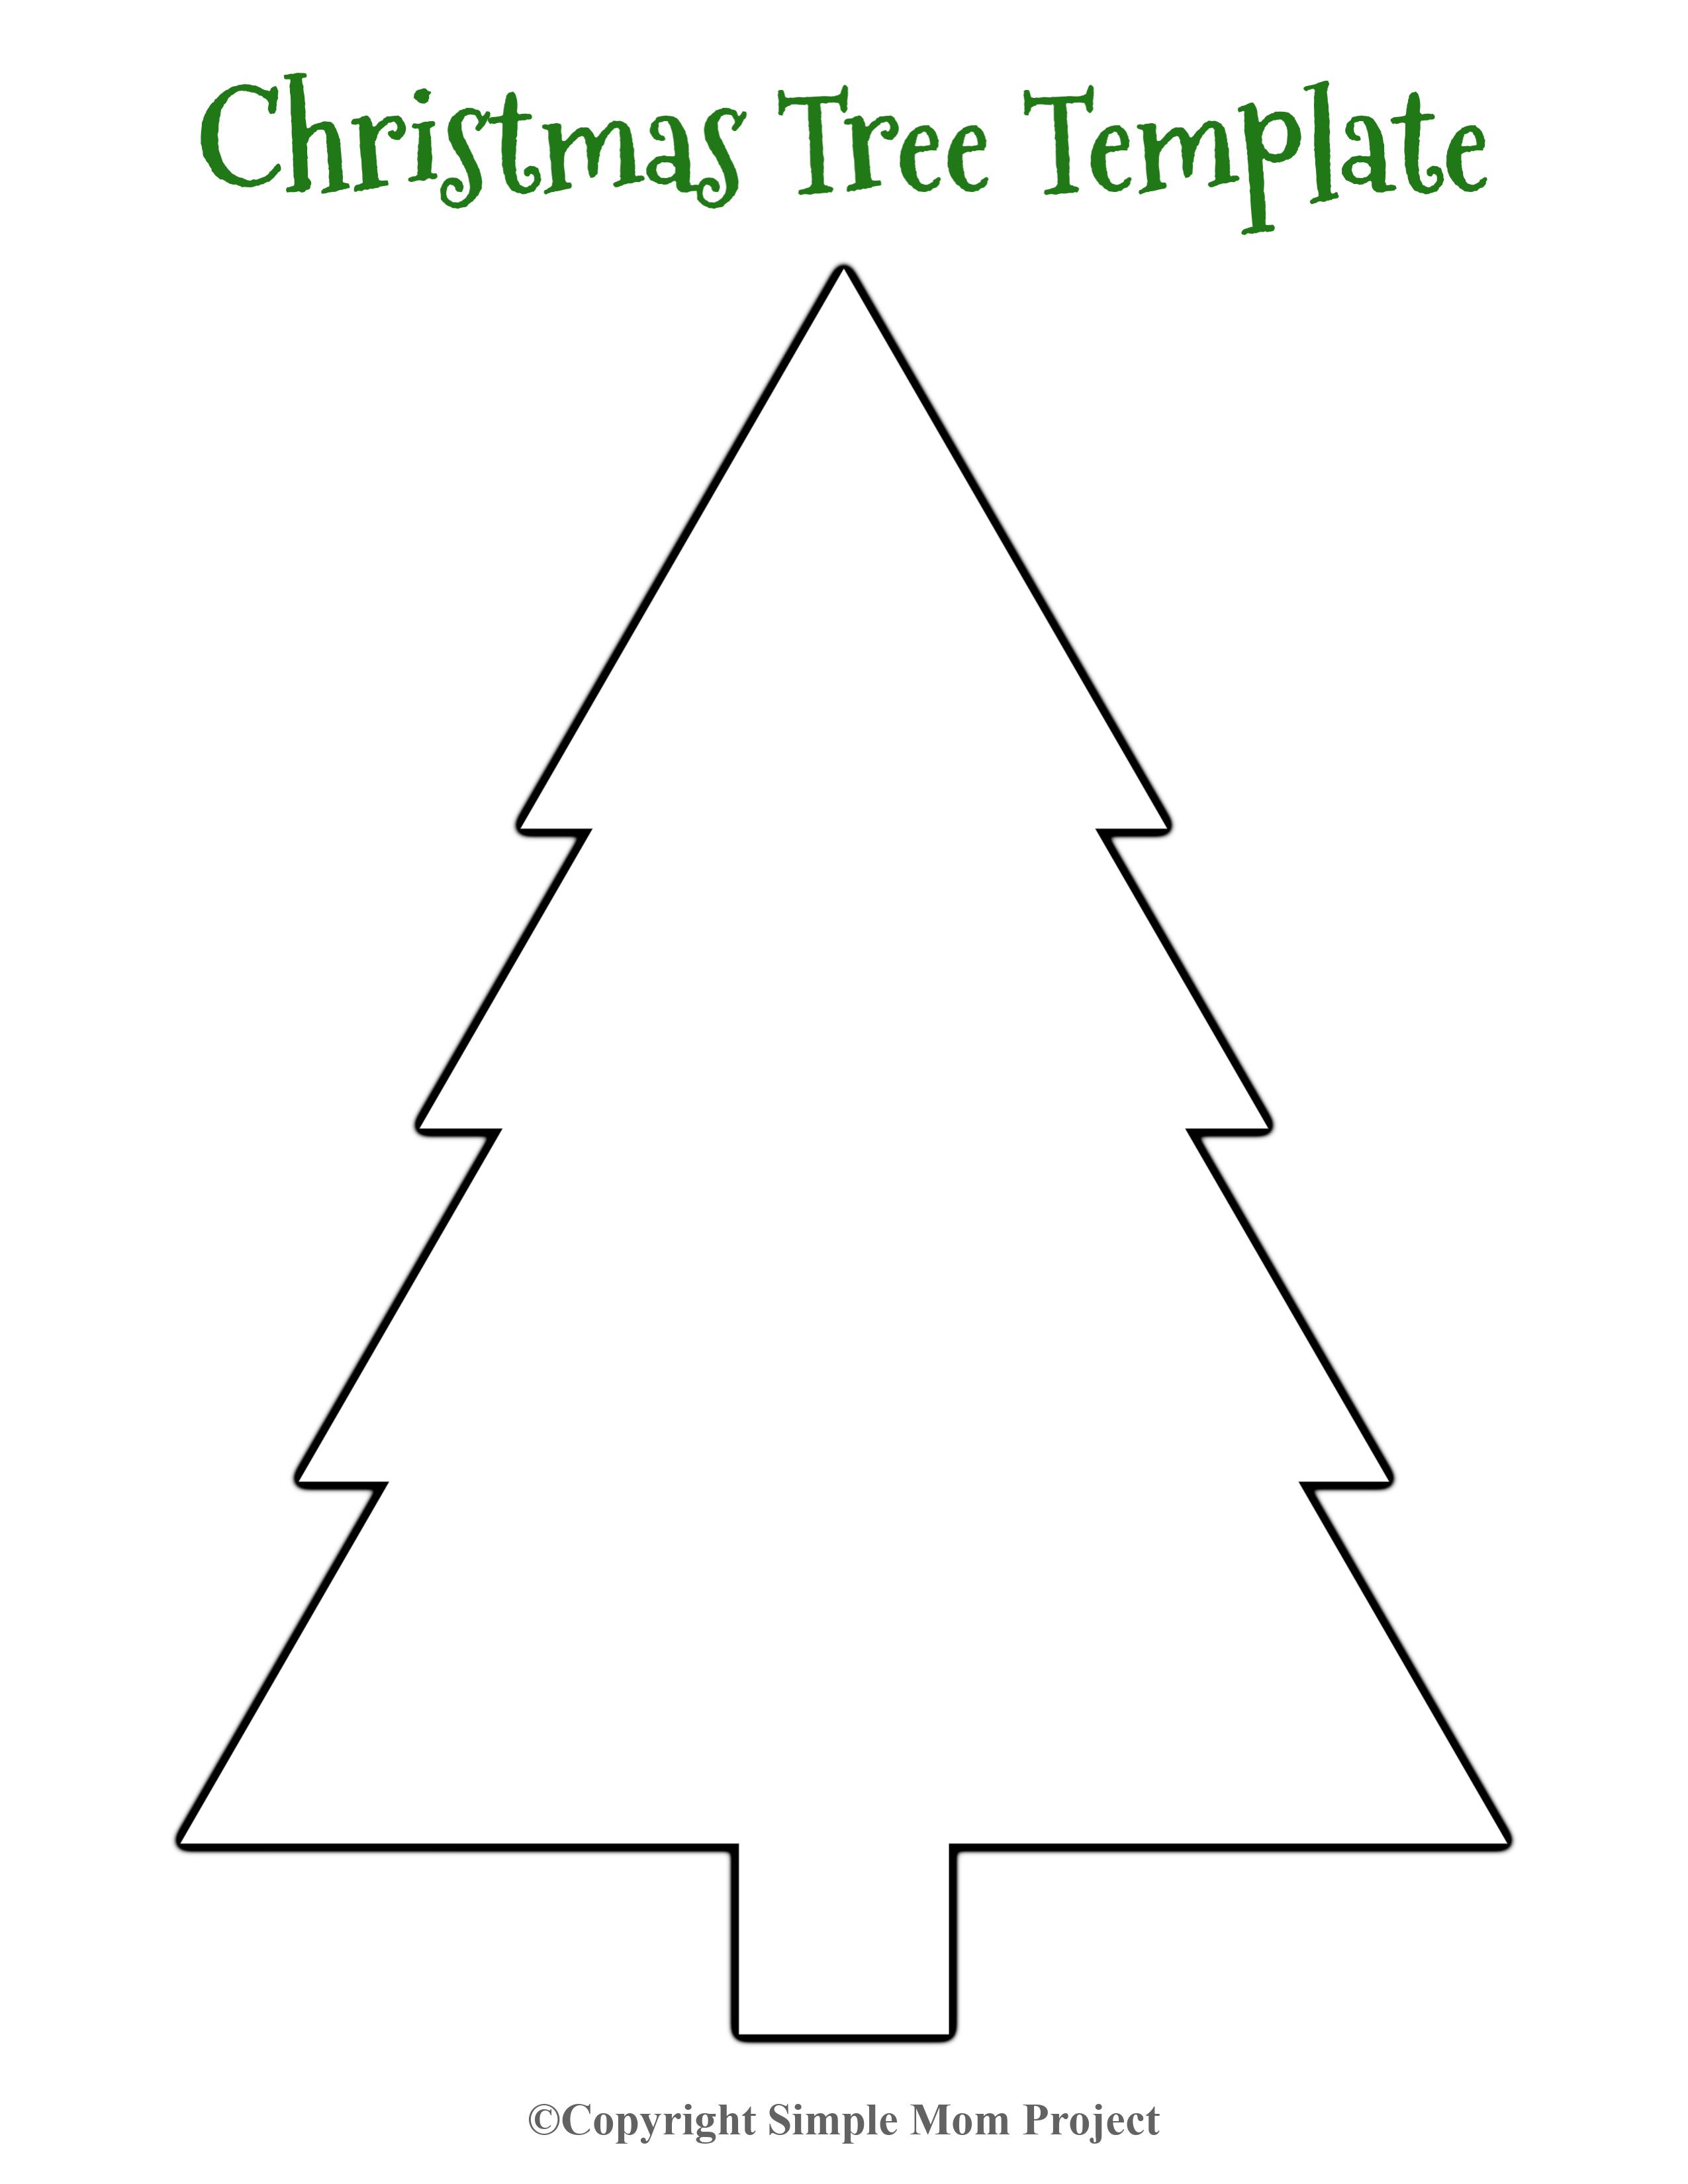 8 Free Printable Large Snowflake Templates Christmas Tree Template Christmas Tree Coloring Page Christmas Tree Printable